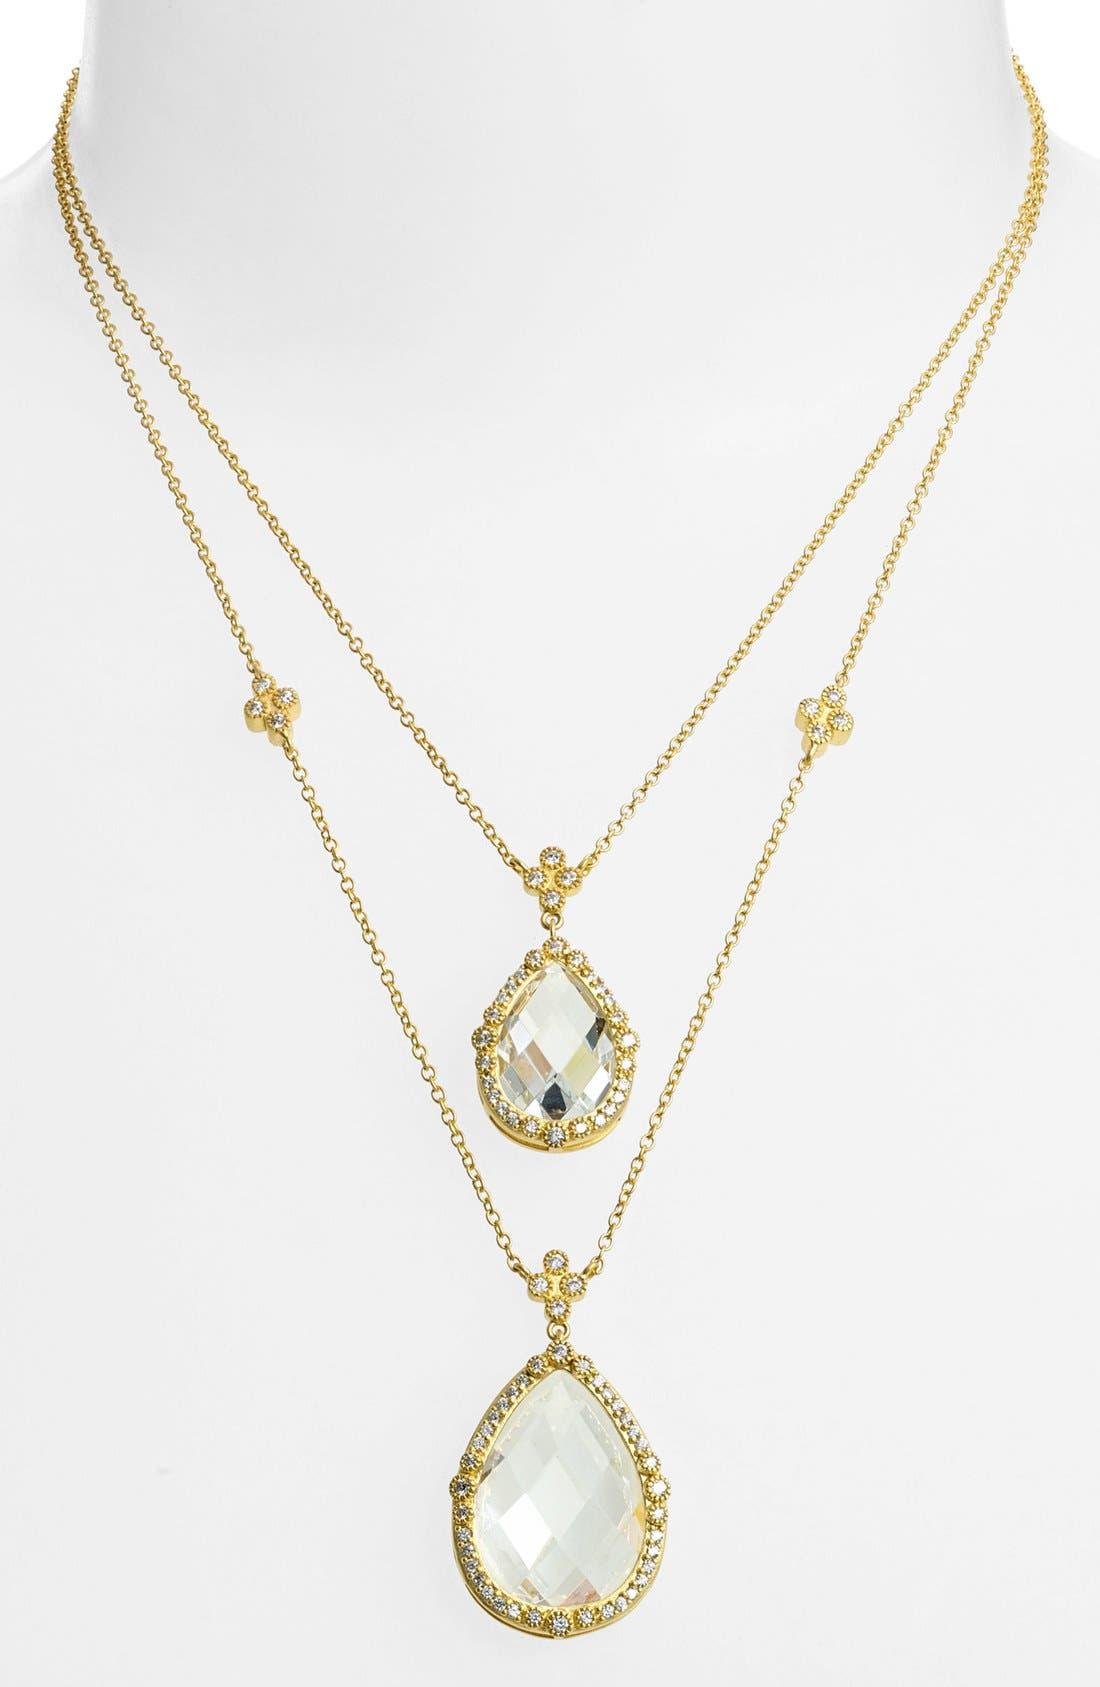 Main Image - FREIDA ROTHMAN 'Metropolitan' Multistrand Pendant Necklace